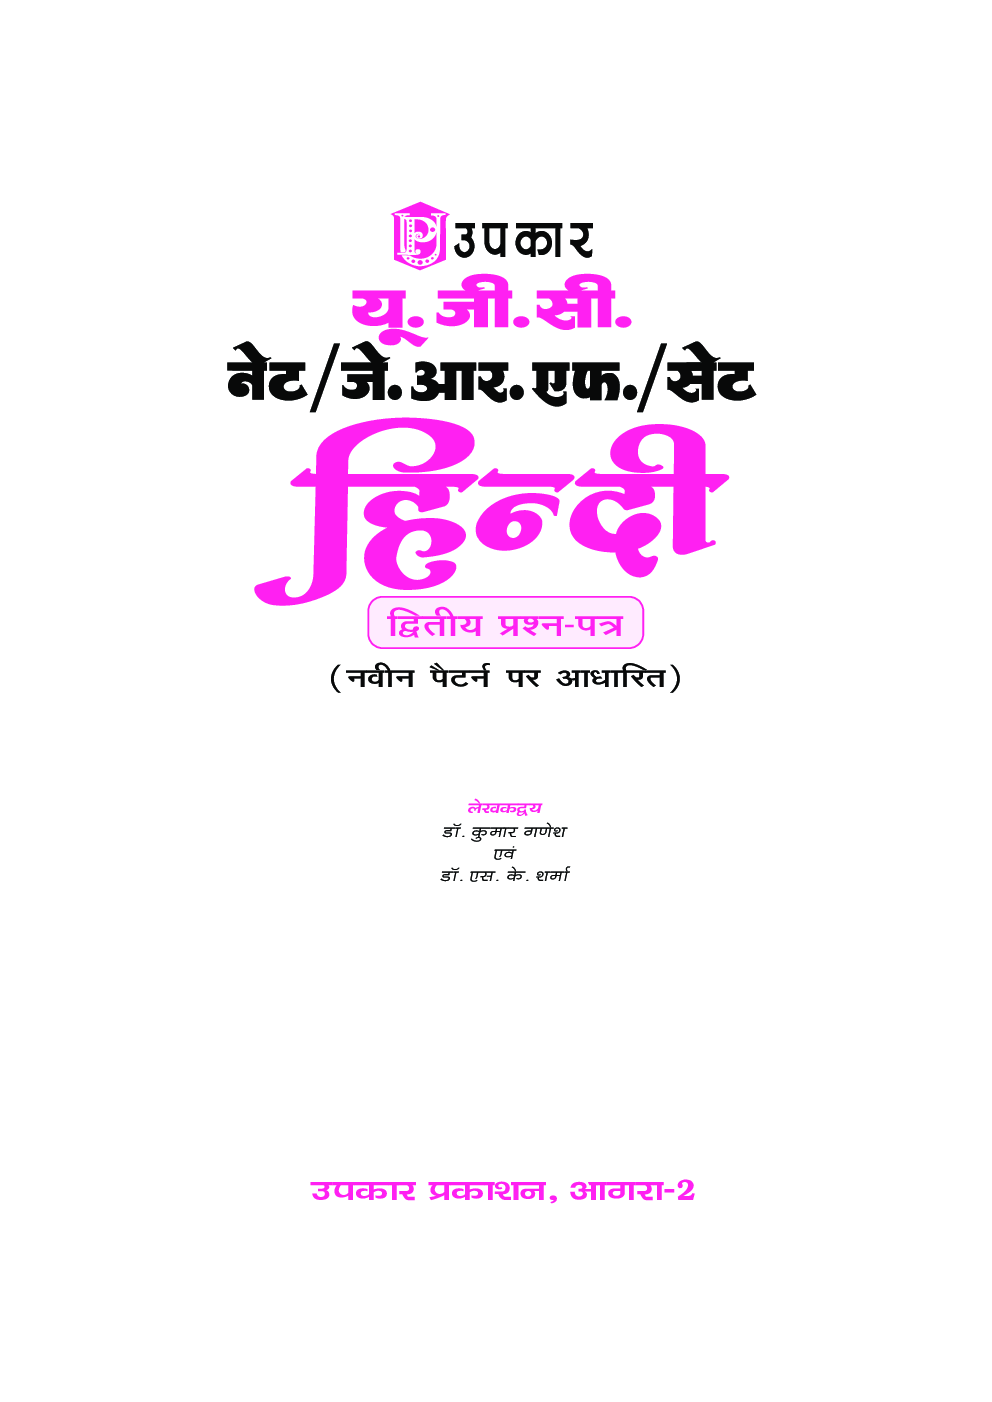 UGC NET/JRF/SET हिंदी Paper-II - Page 2